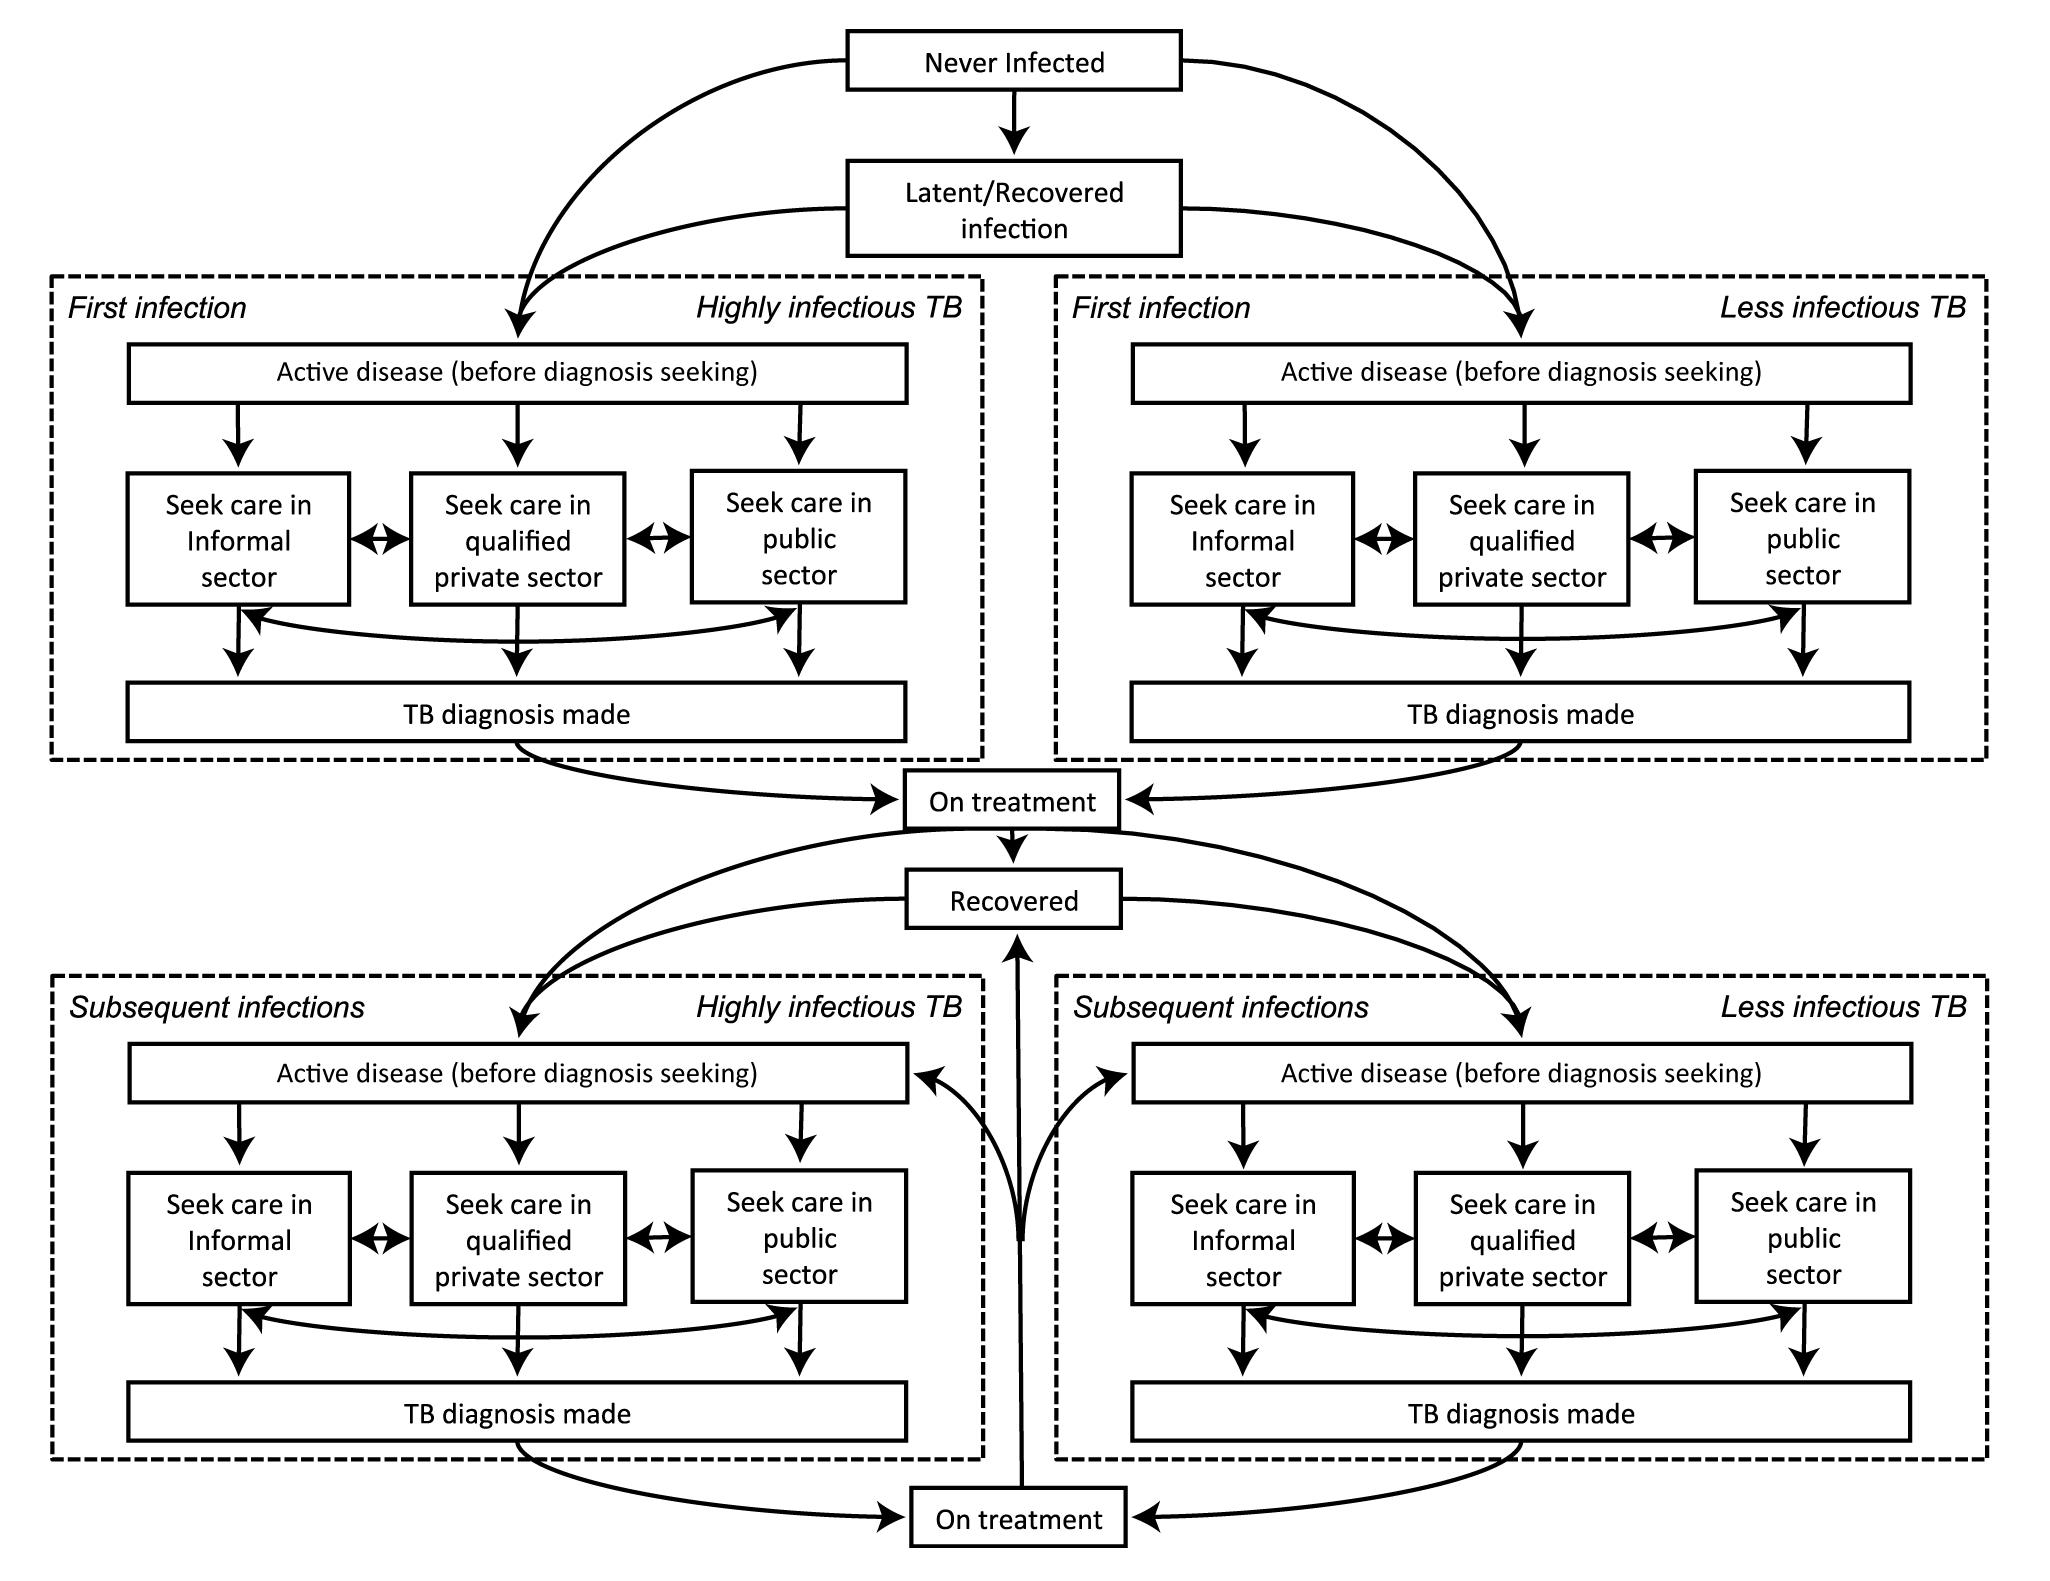 Model schematic.